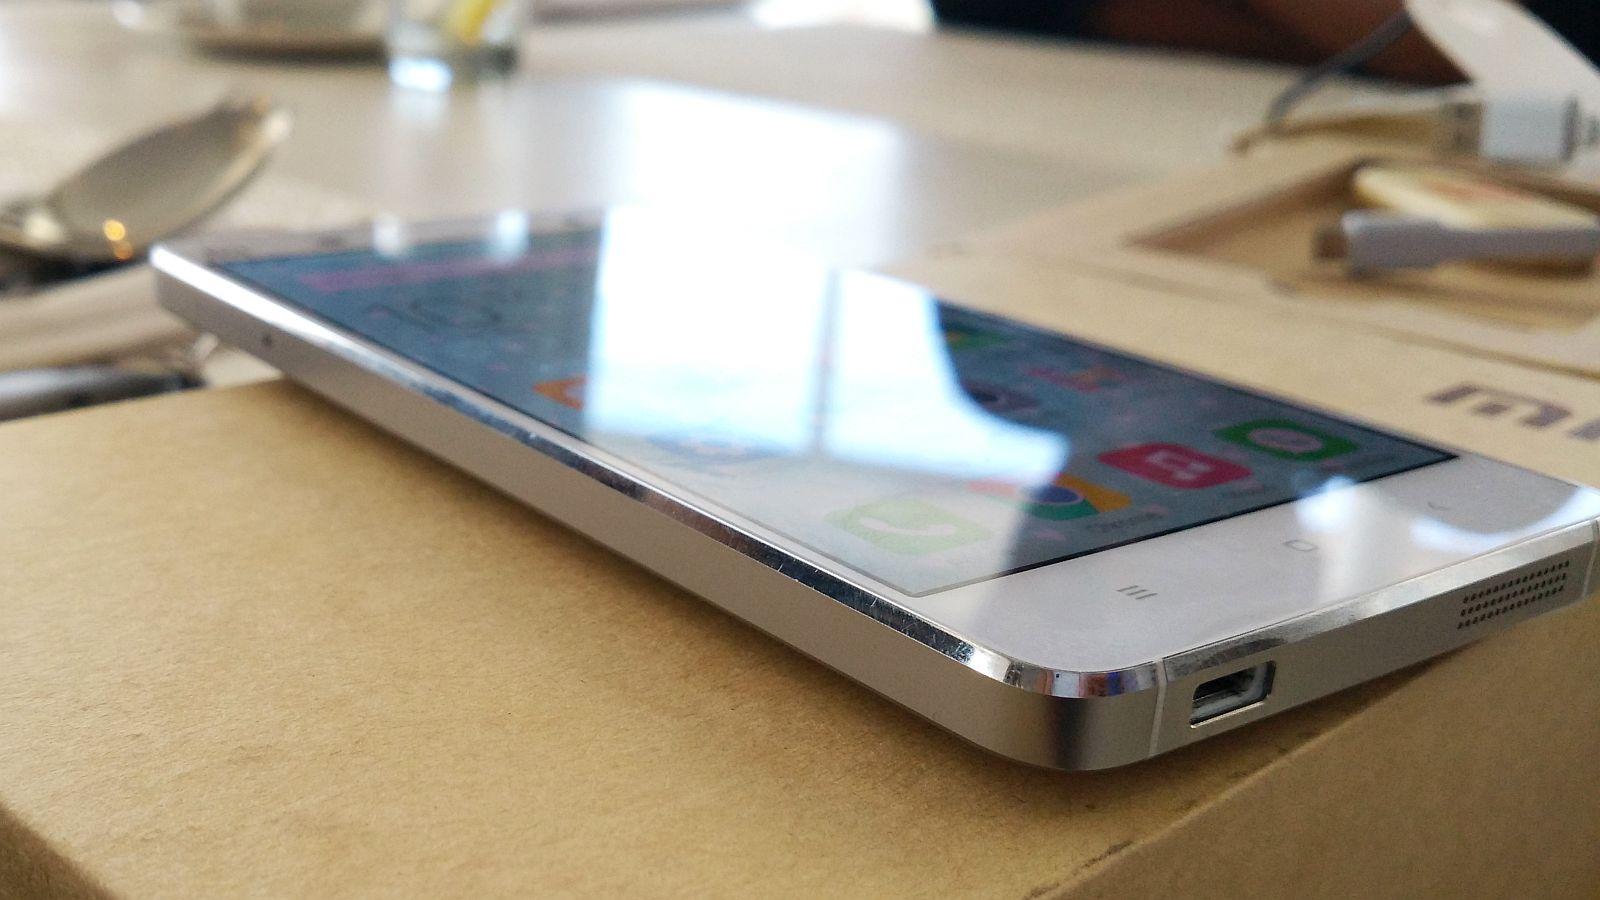 Xiaomi Mi 4 hands on 5